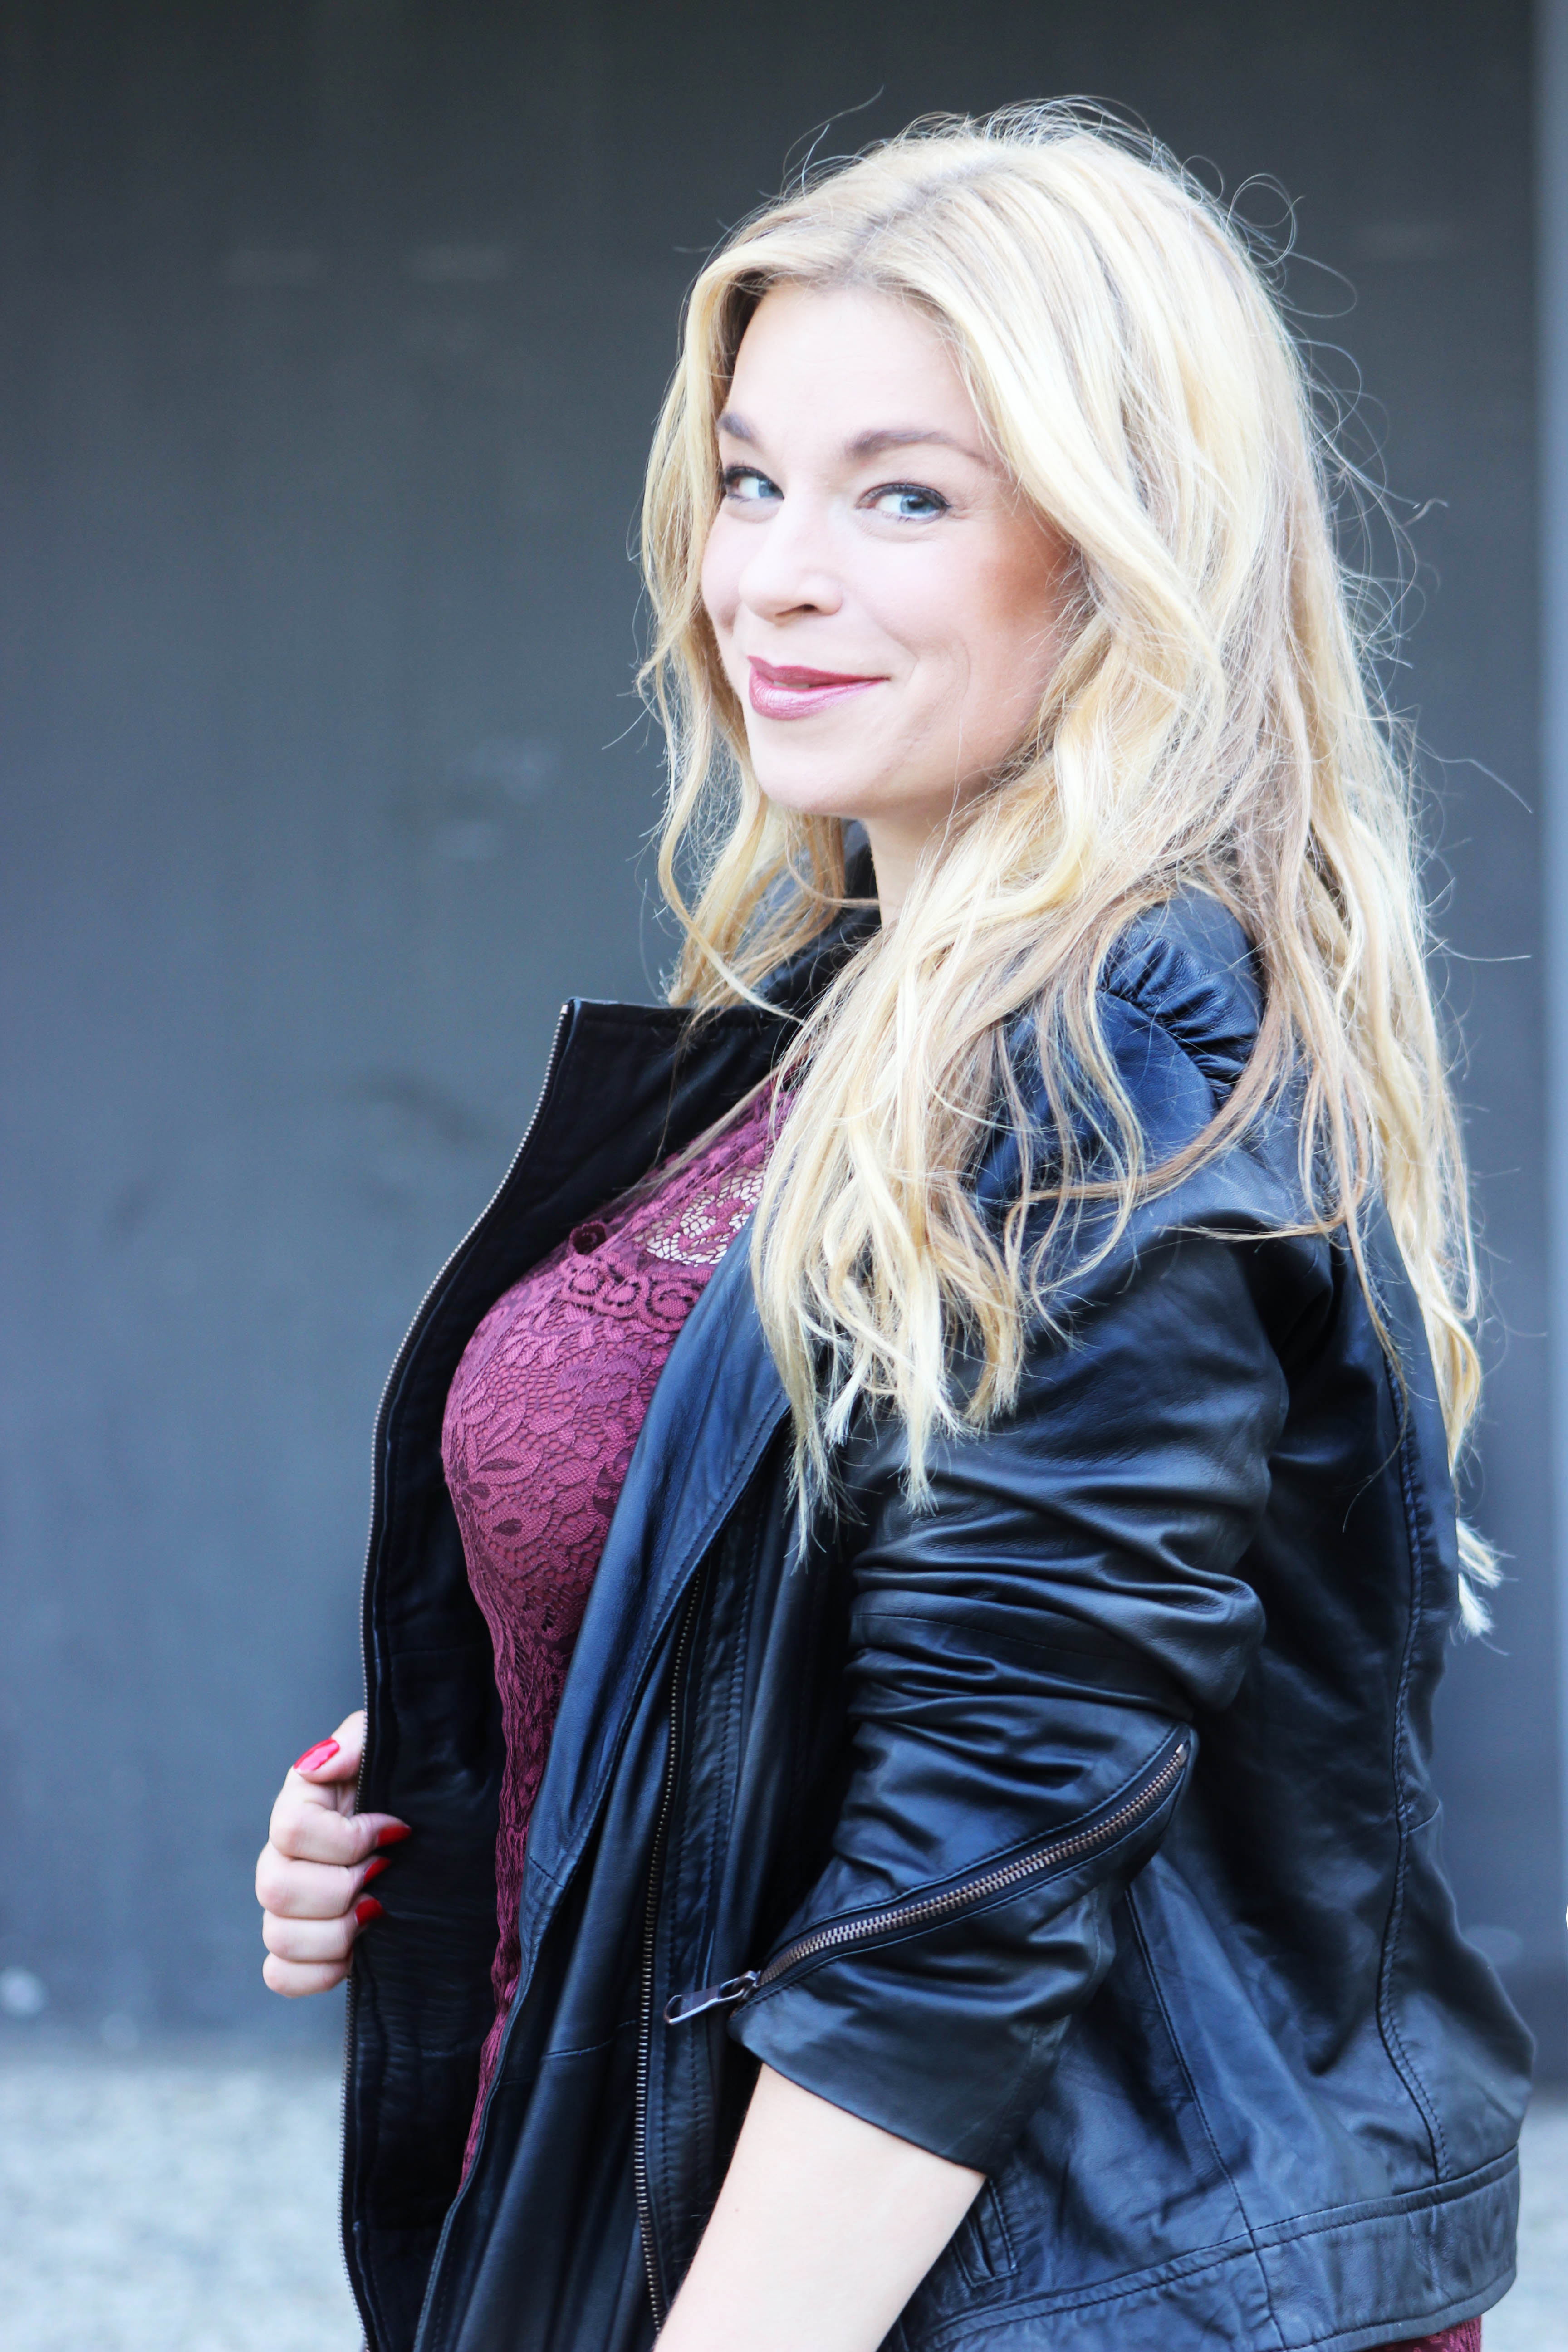 Marsala-Caterina-pogorzelski-Sheego-Plussizeblogger-Annascholz-Megabambi